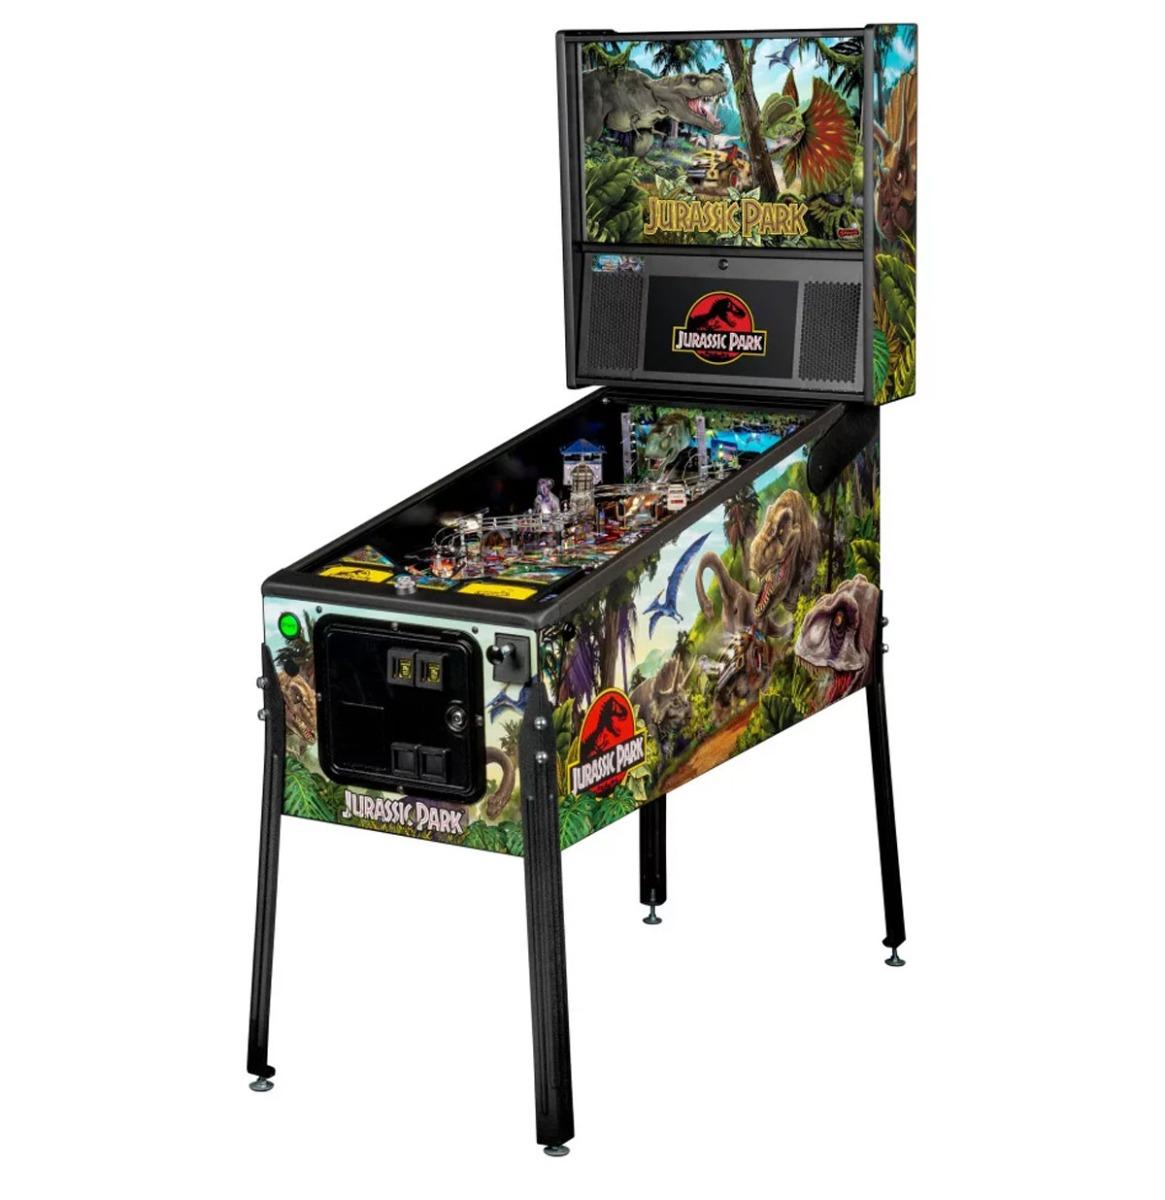 Jurassic Park Flipperkast - Stern - Pro Editie